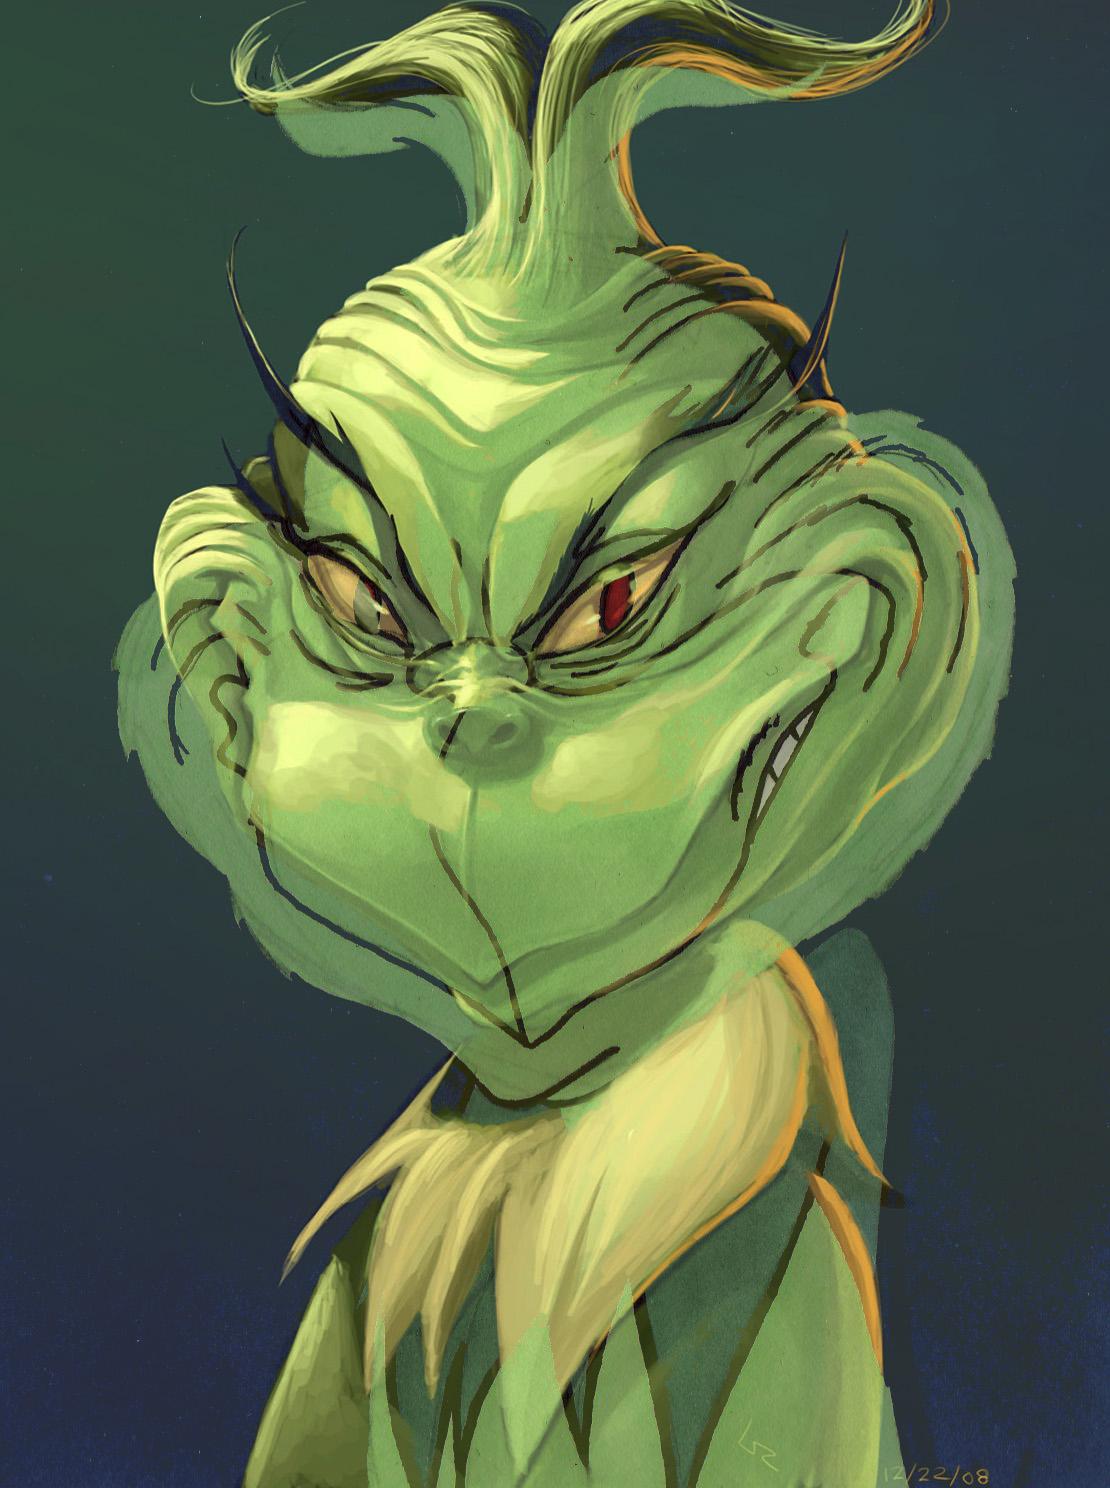 mimundokf: YO Grinch